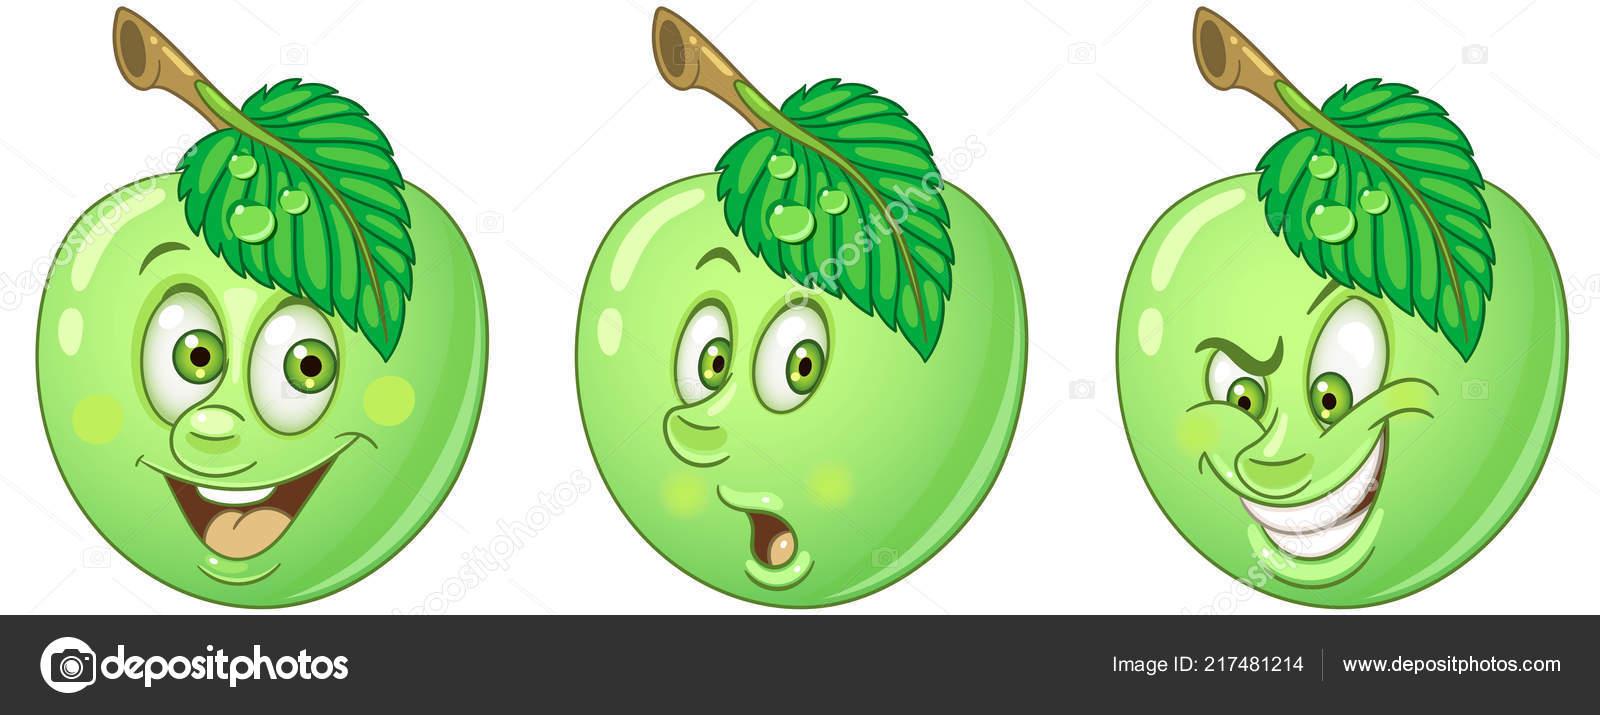 Coloriage Pomme Et Oignon Dessin Anime.Pomme Concept Nourriture Saine Collection Emoticones Emoji